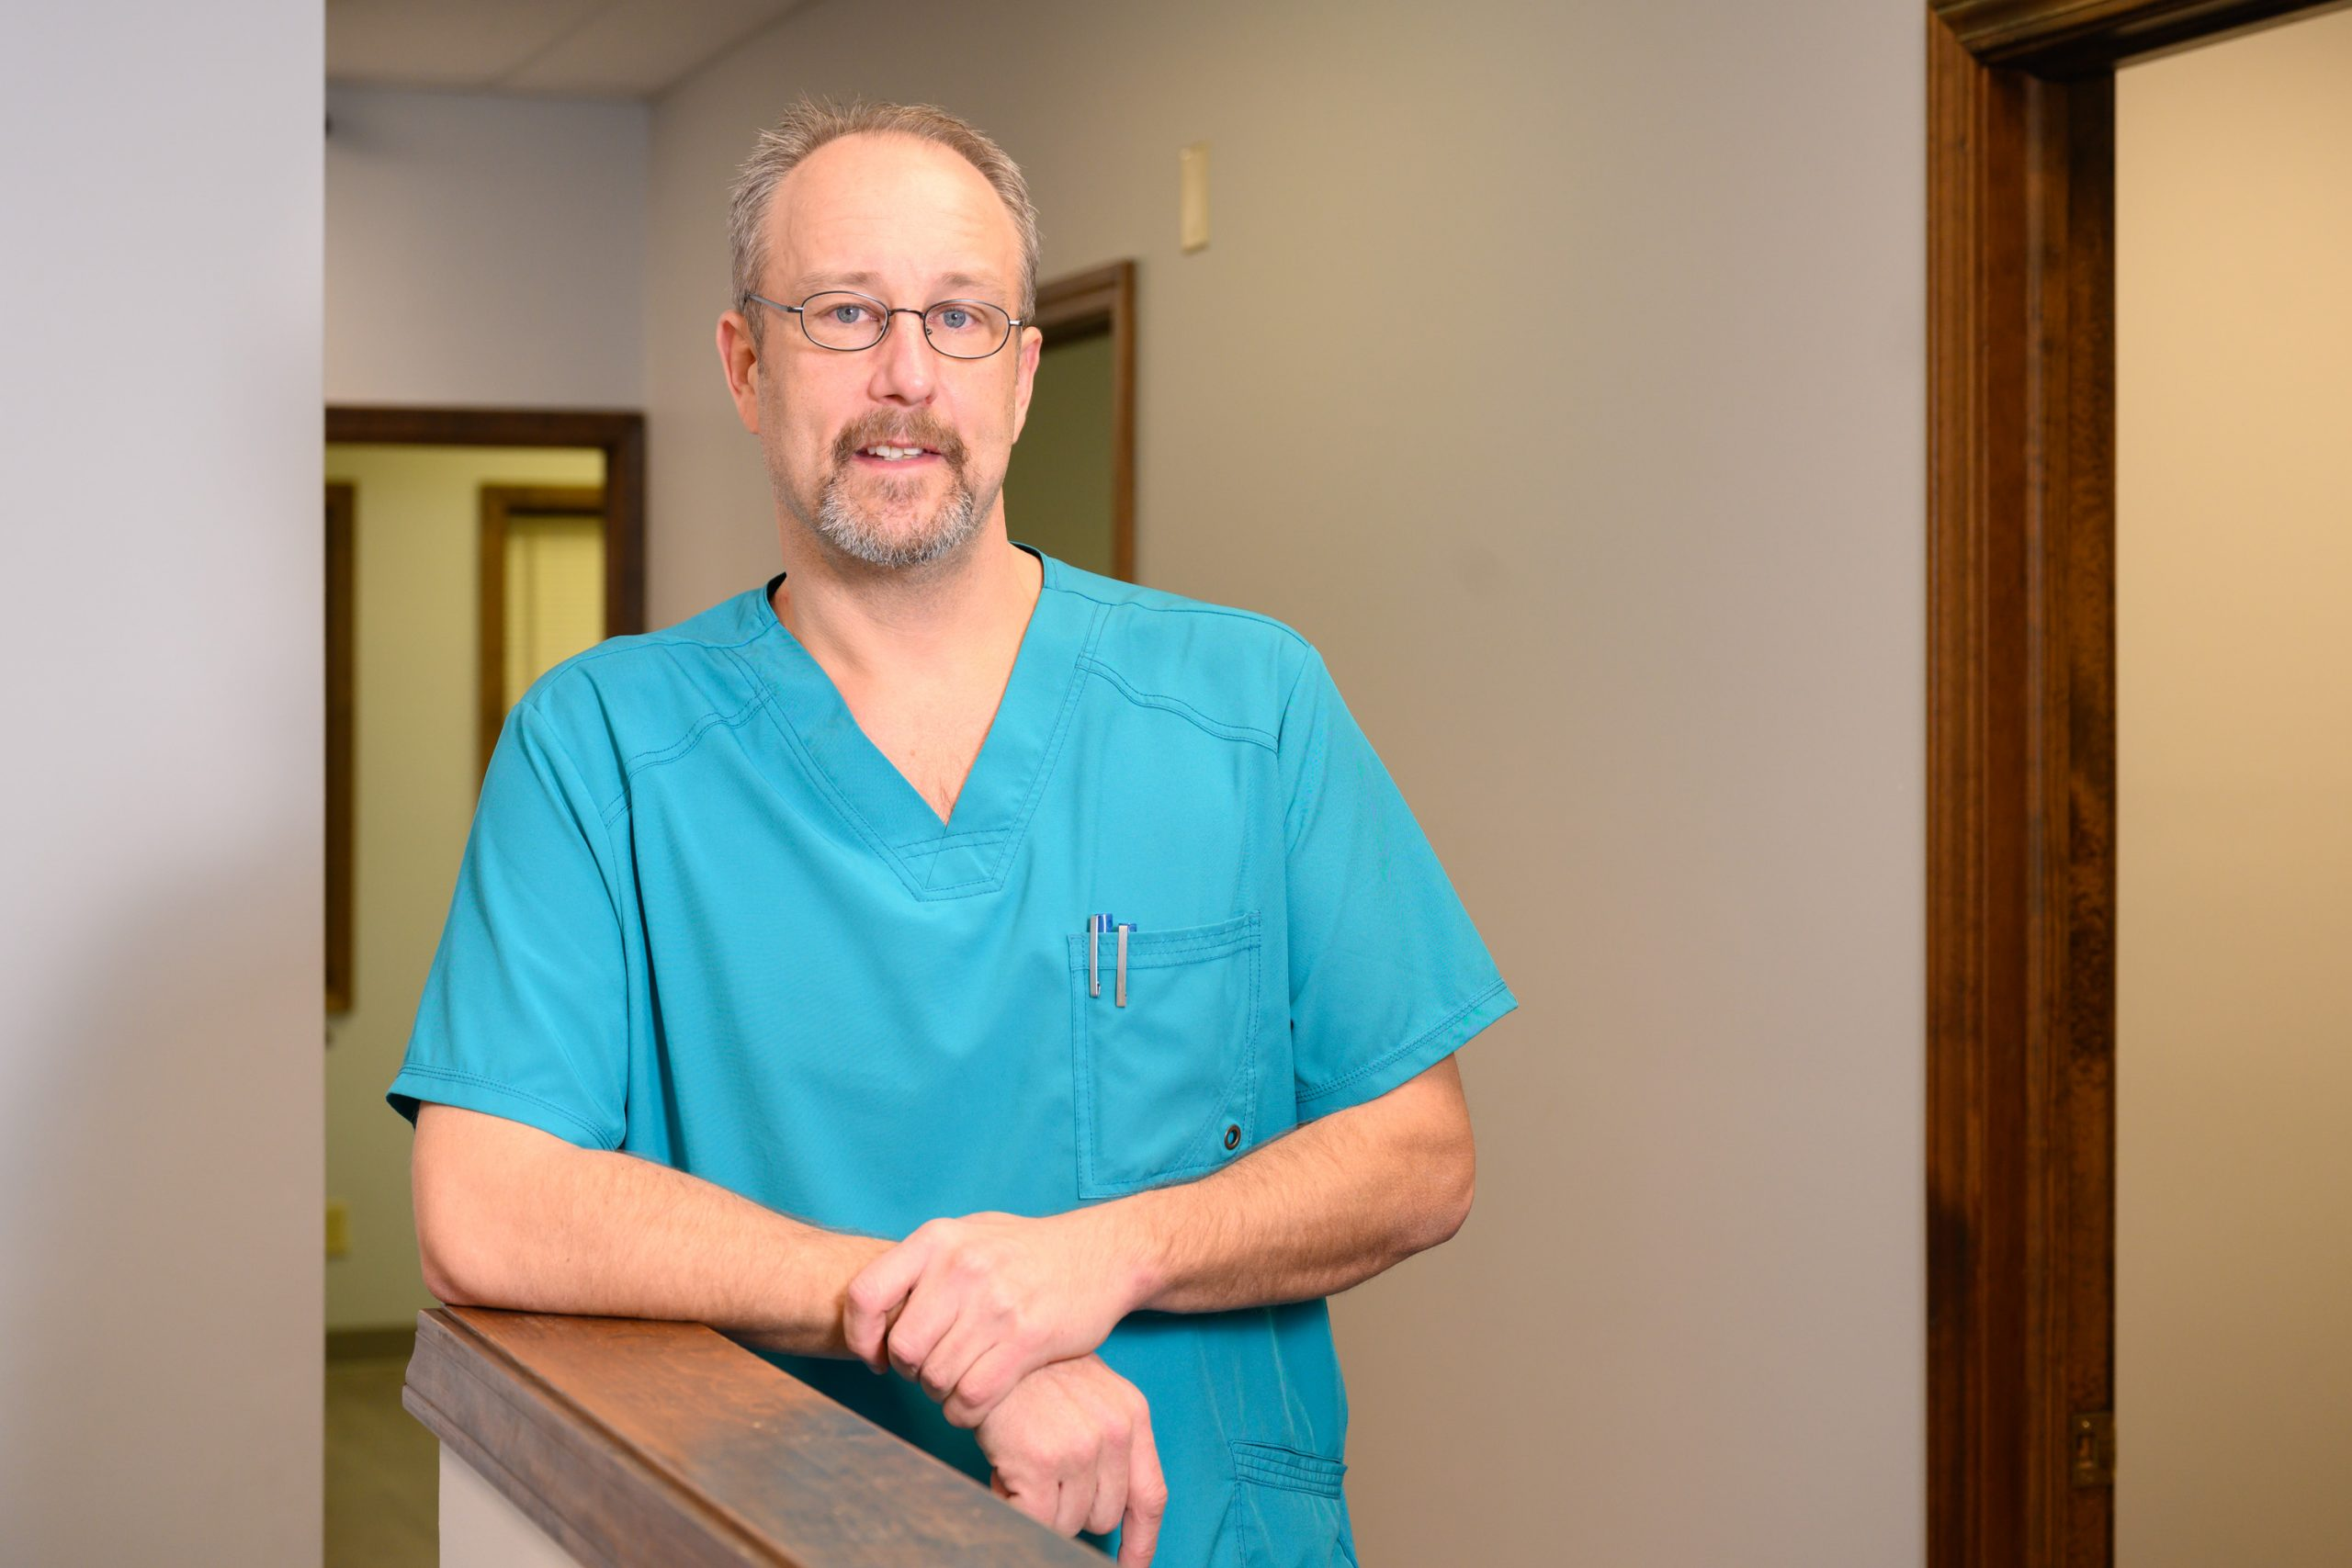 Indiana Regenerative Medicine Institute Offers